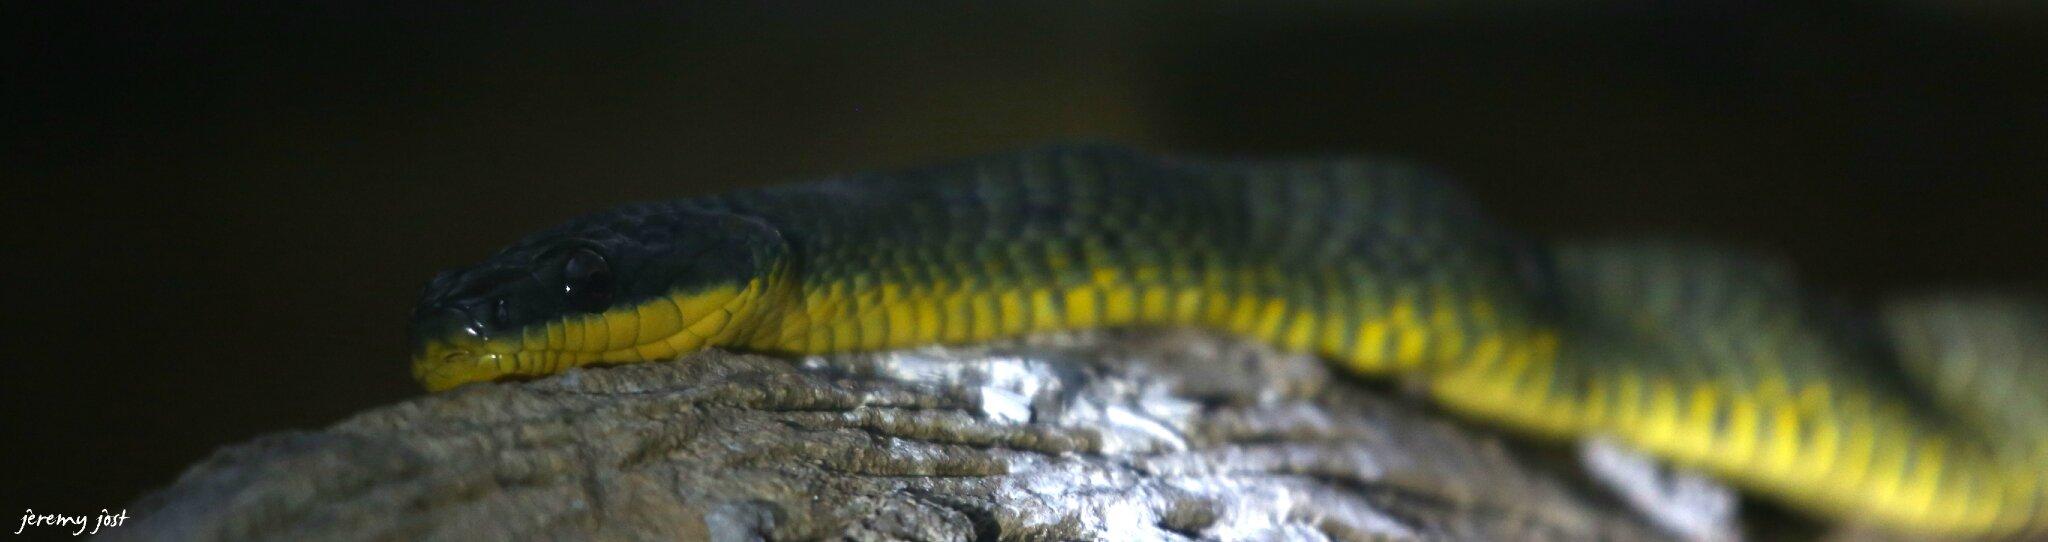 snake costa rica